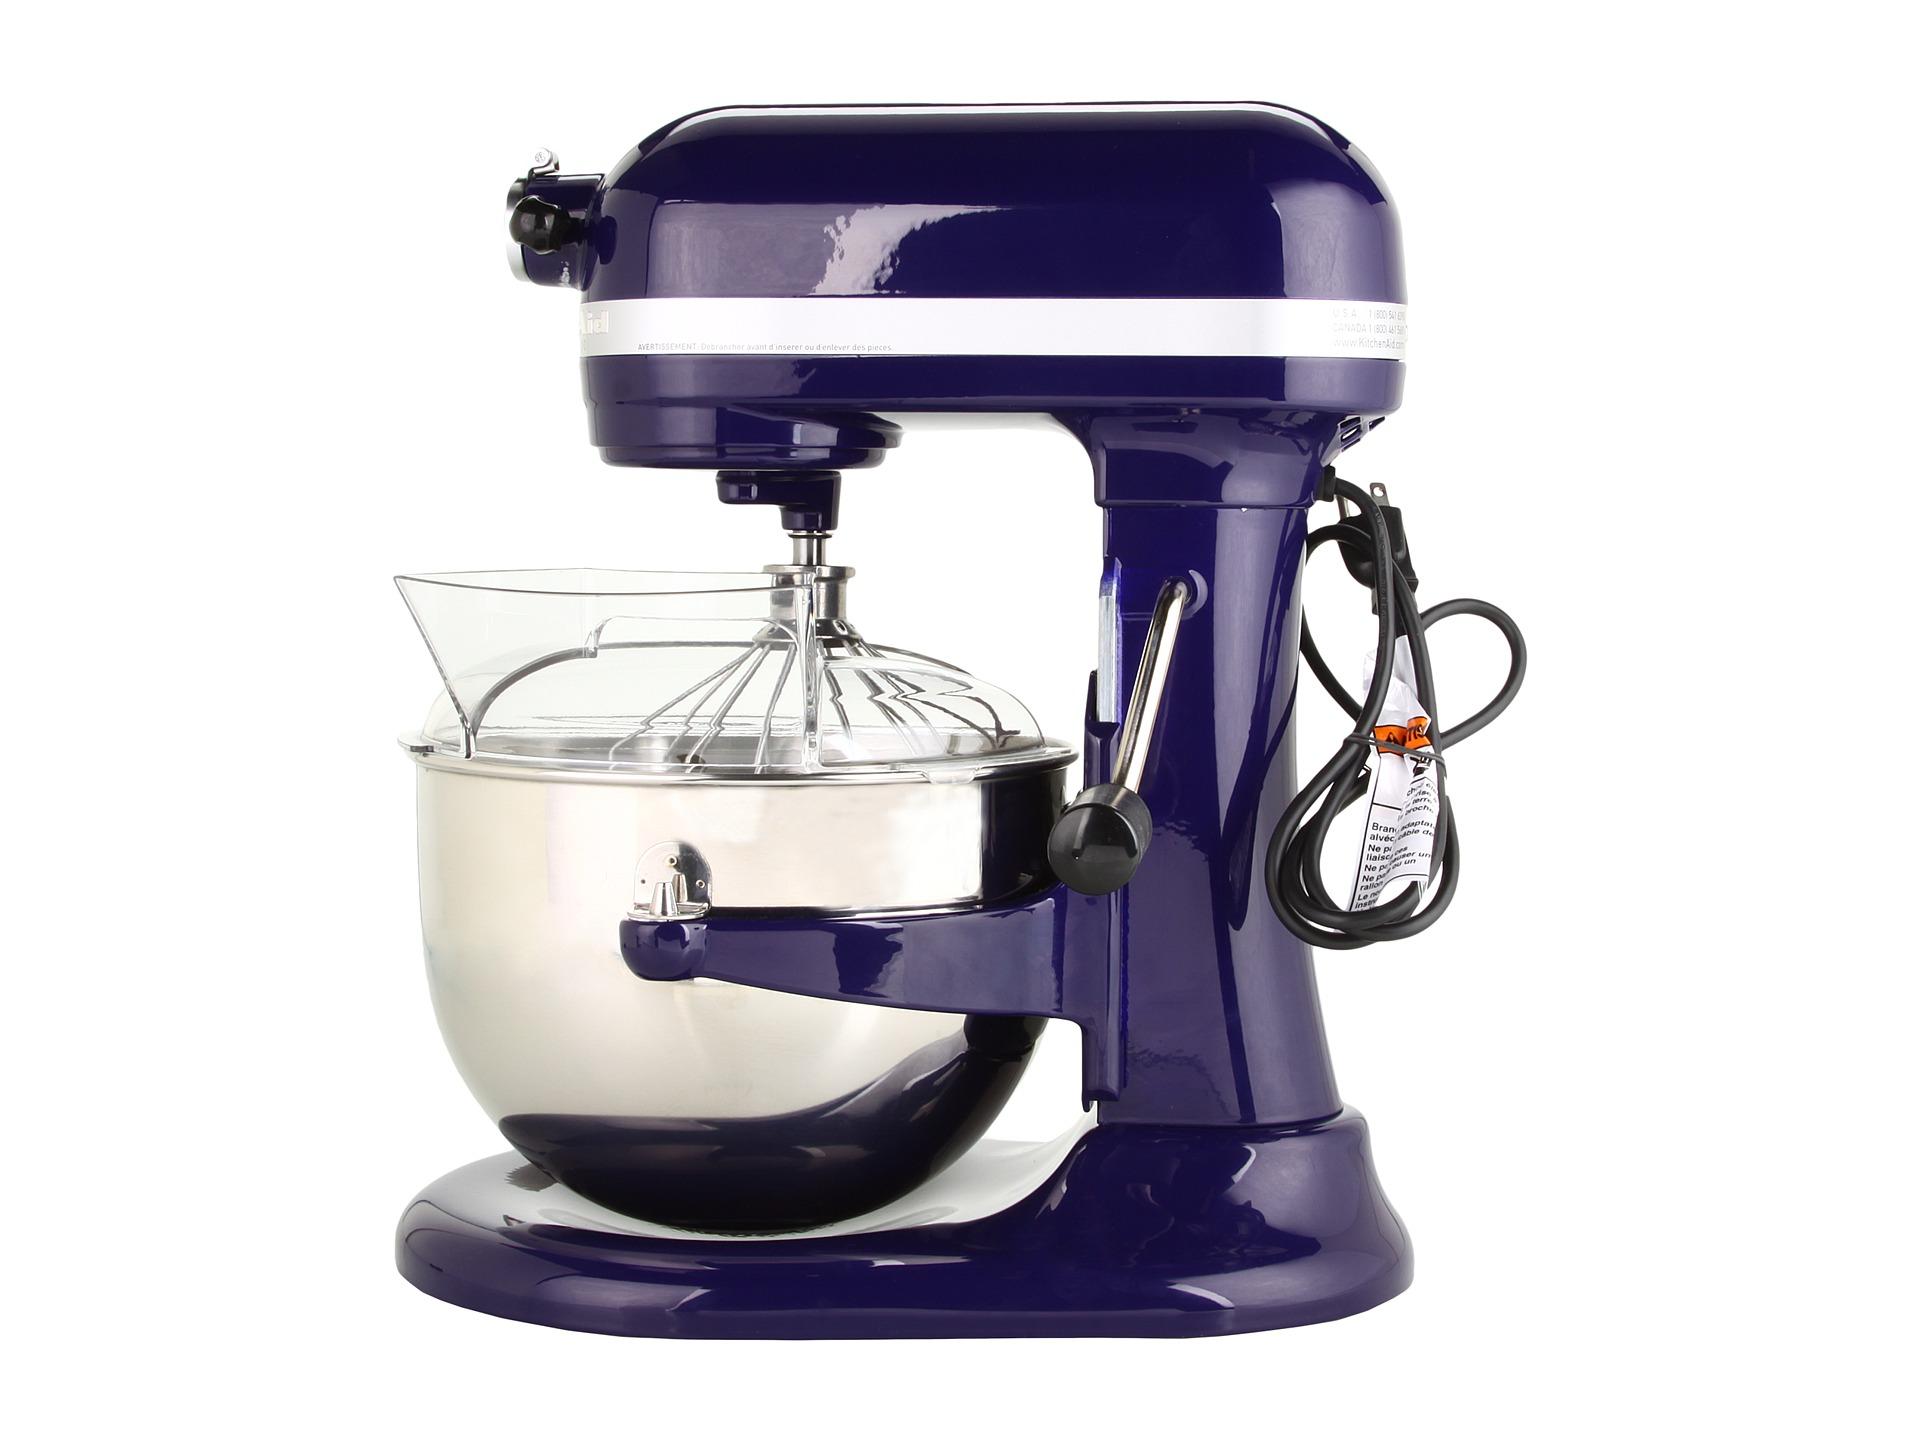 Blue Kitchenaid Mixer ~ New kitchenaid pro cobalt blue stand mixer quart